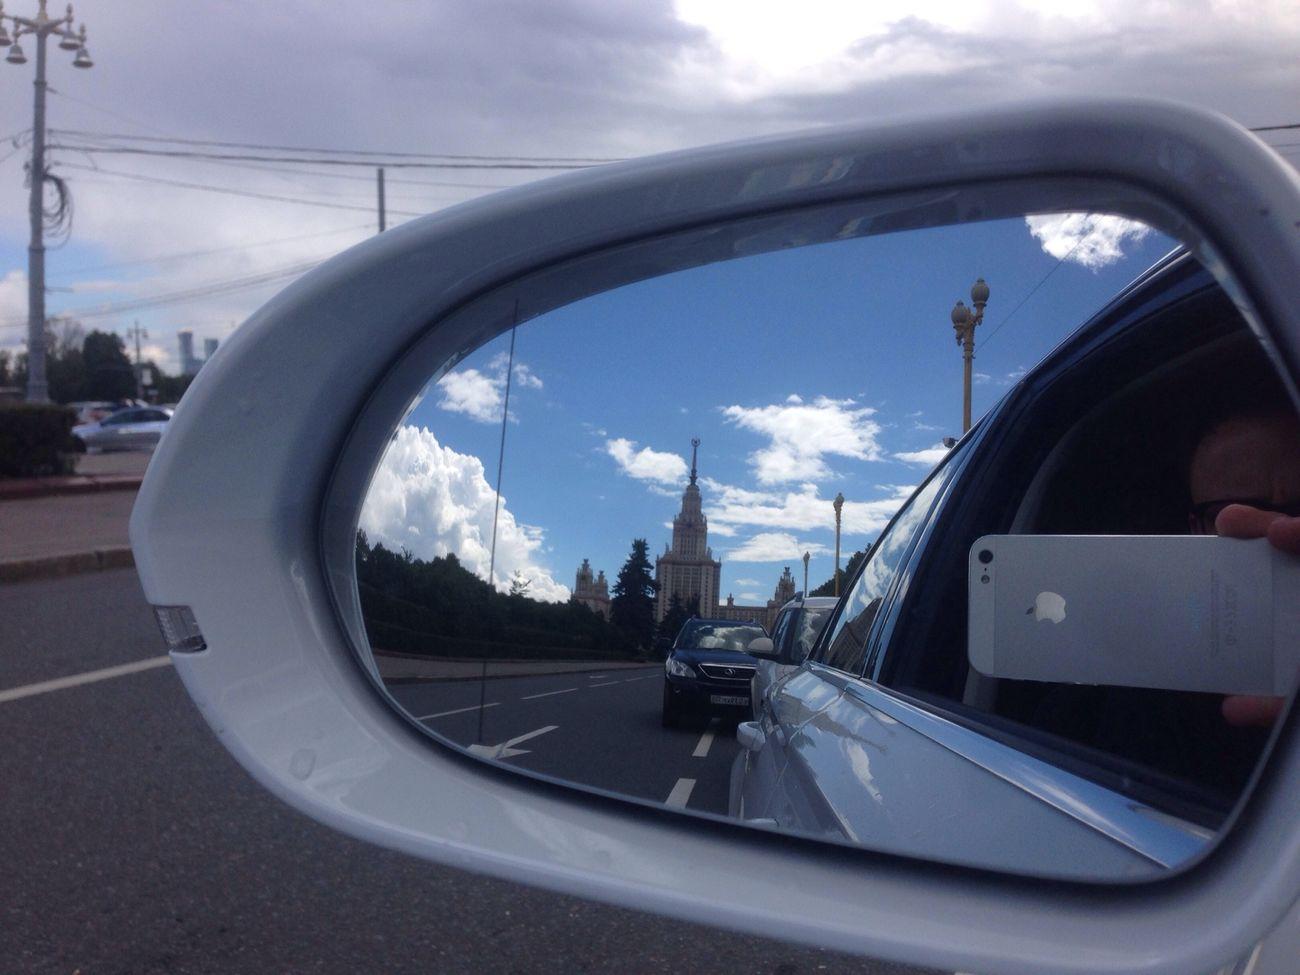 Audi A6 Cars Mgu Smotra